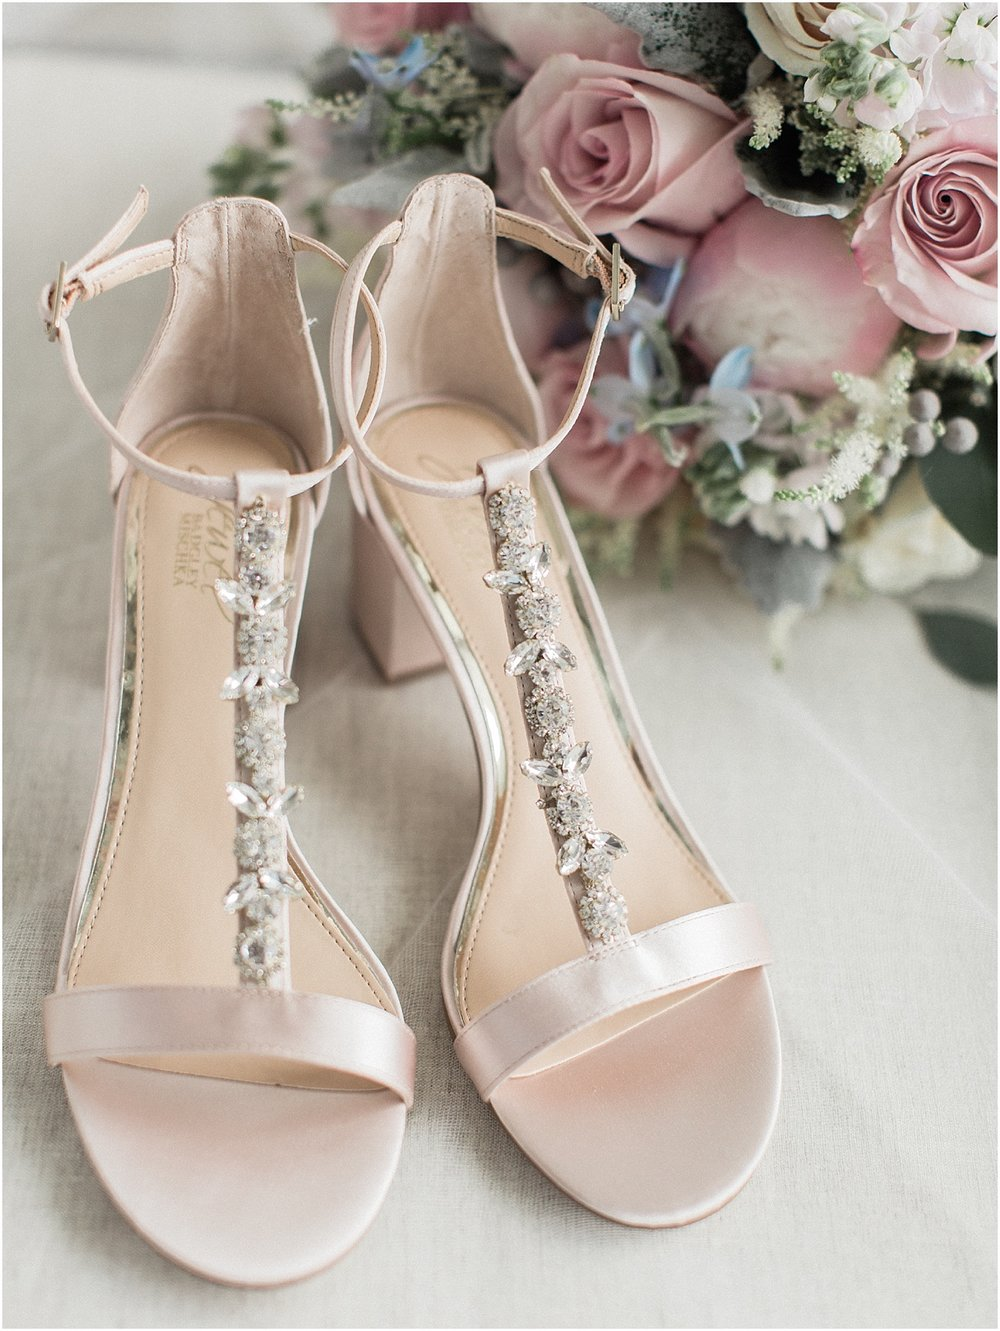 kelly_zach_cruisport_gloucester_ma_bass_rocks_cape_cod_boston_wedding_photographer_meredith_jane_photography_photo_0645.jpg